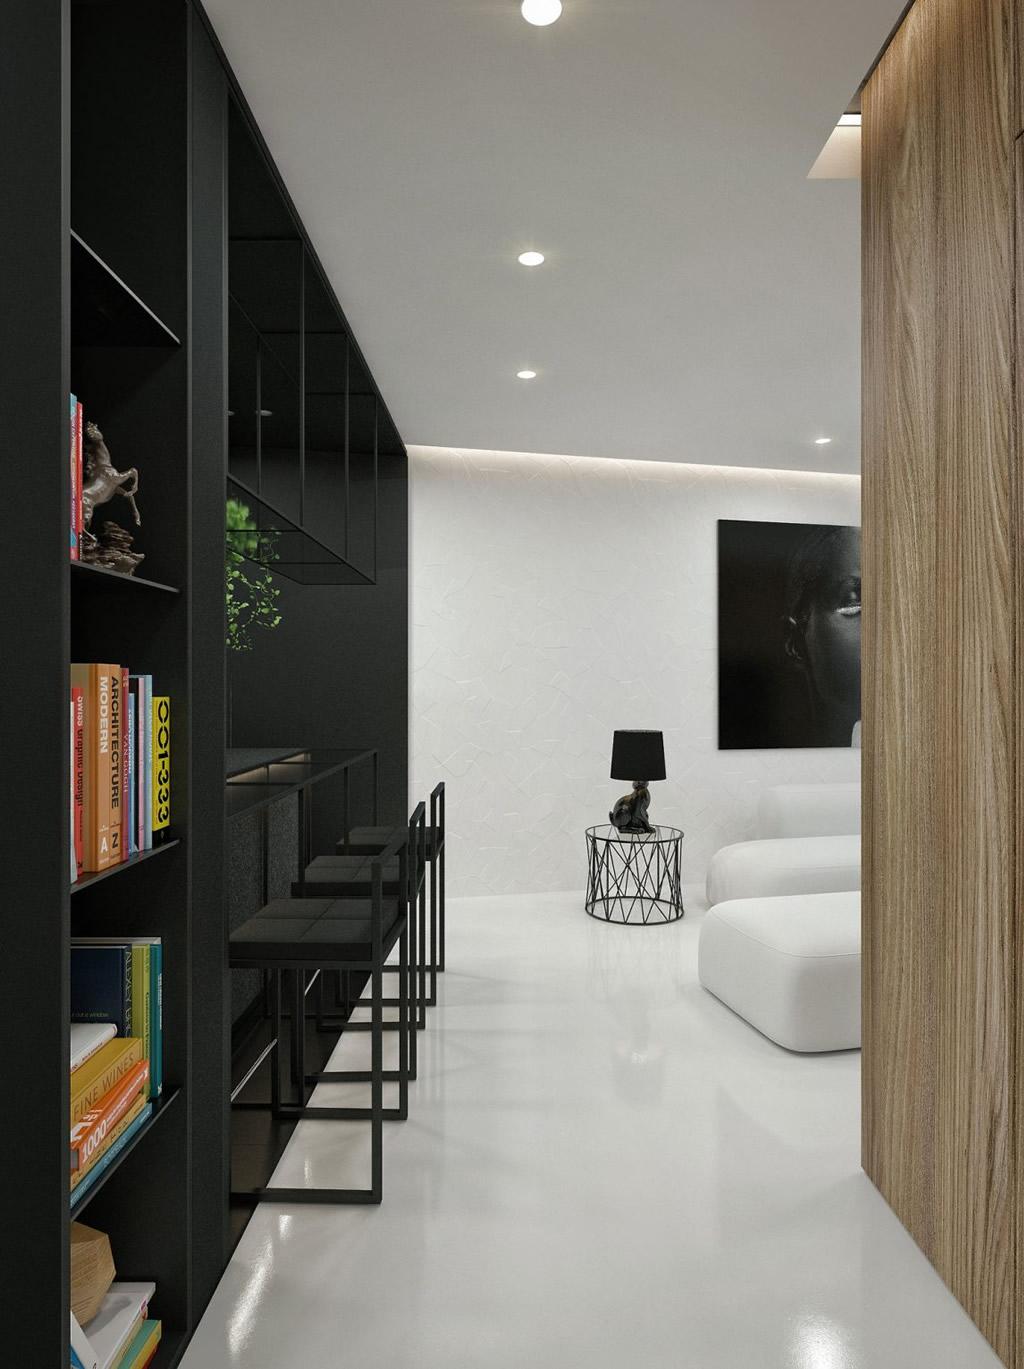 Cozy Modern Apartment In Kaunas, Lithuania 3